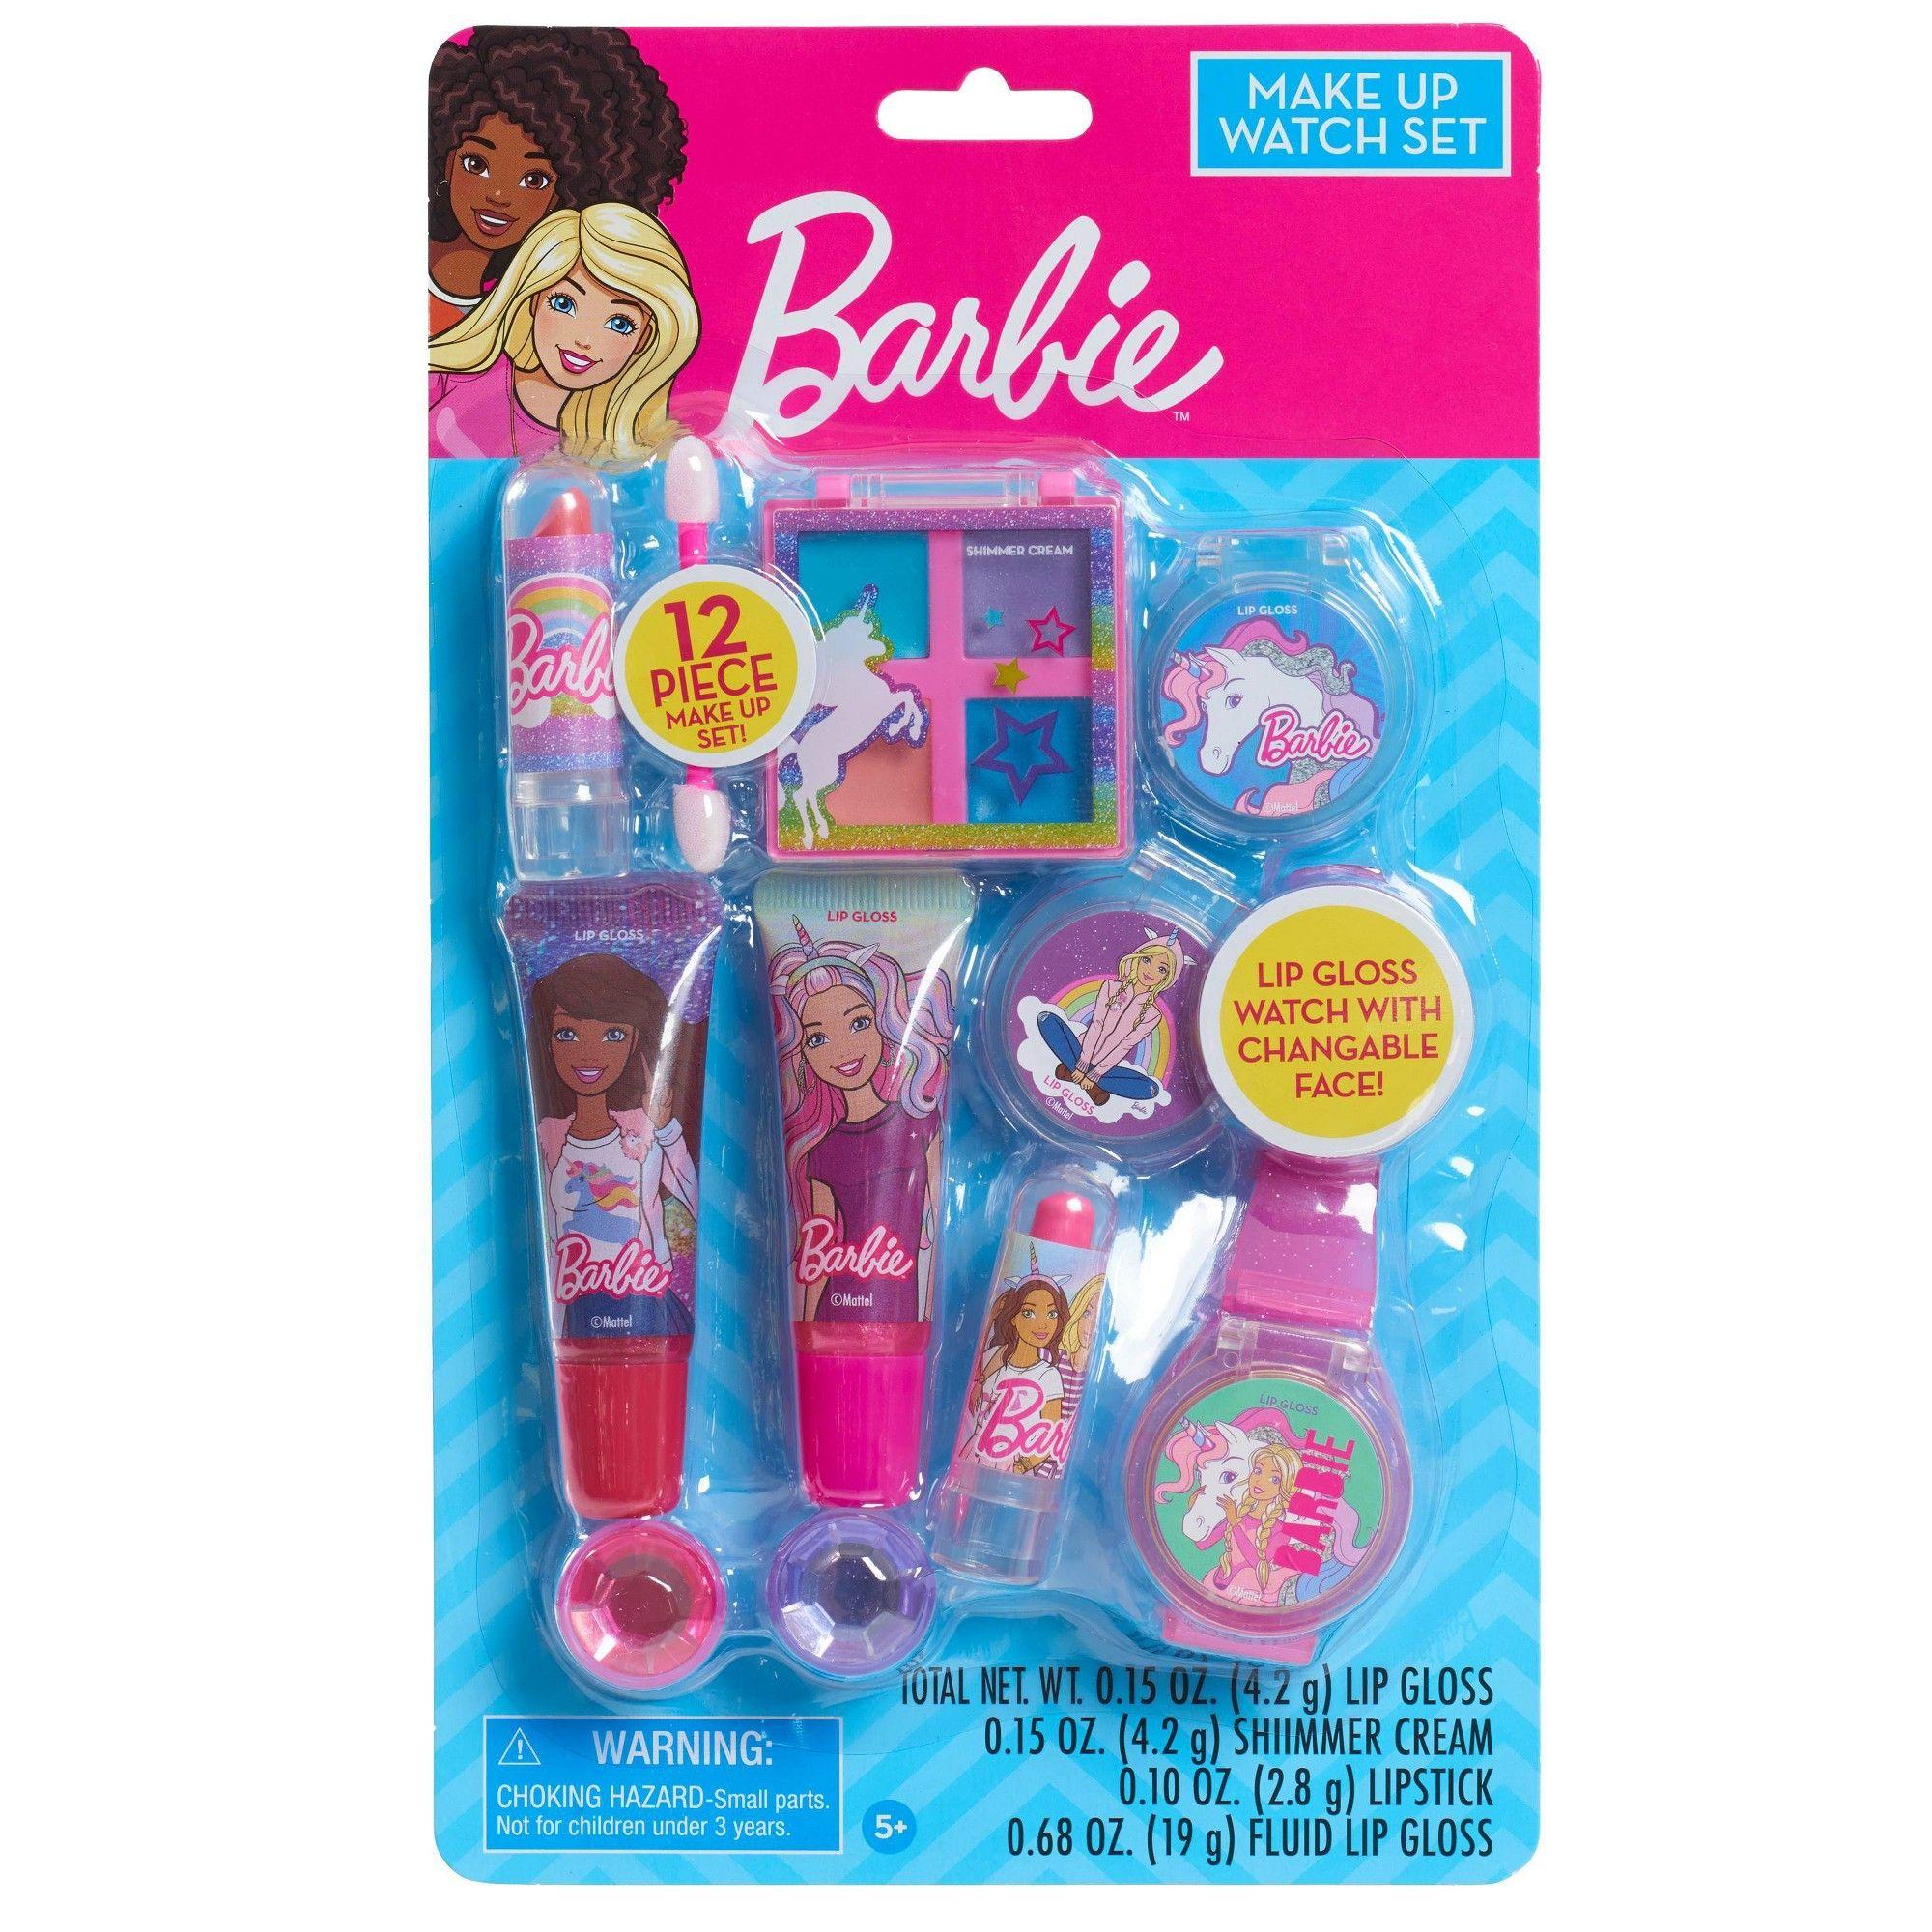 Barbie Make Up Watch Set, Toy Beauty Playsets Barbie